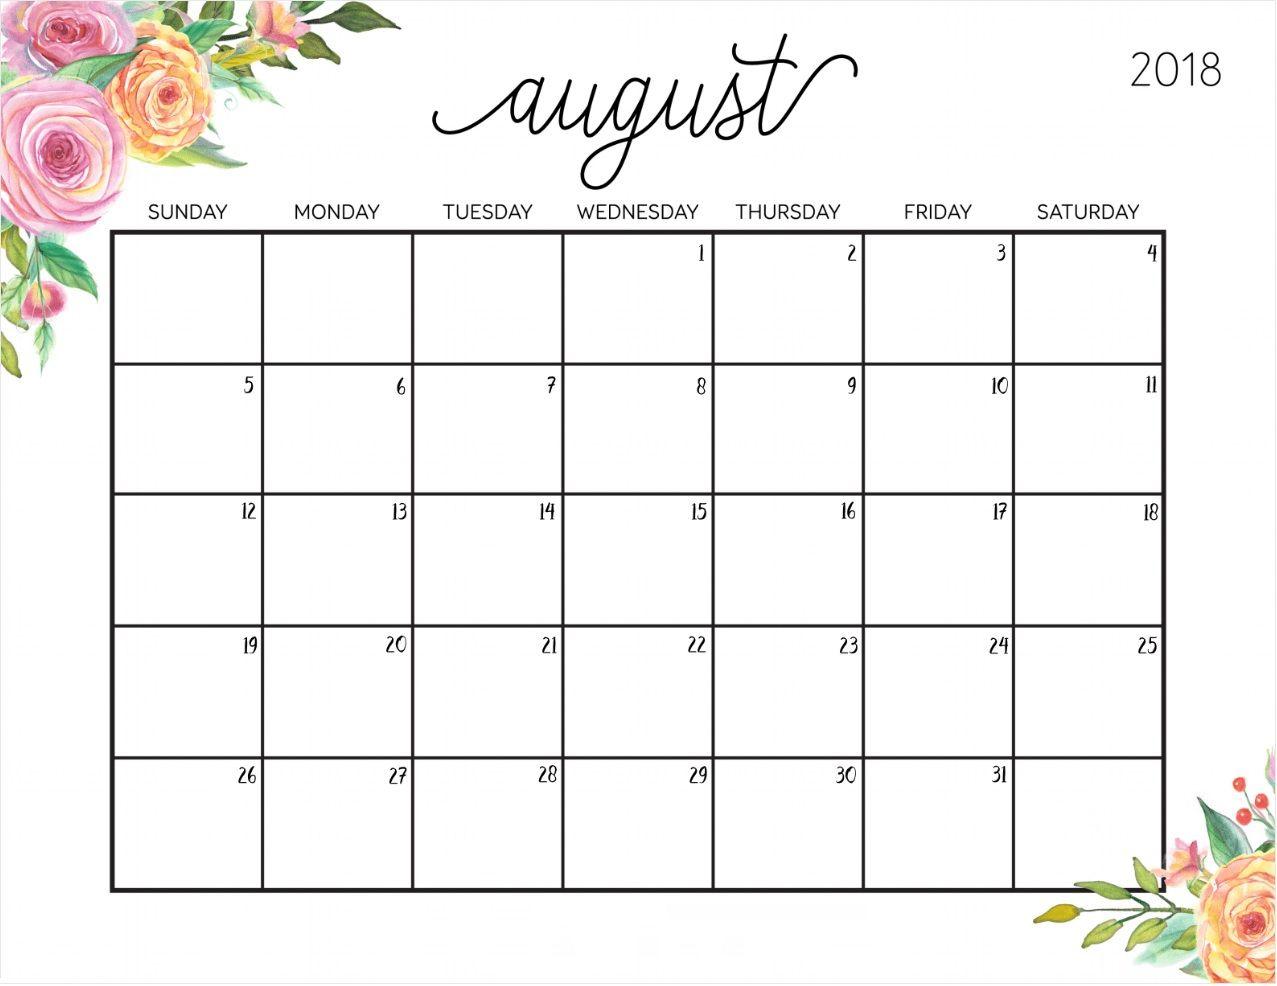 Pinkirstin Palasz On Calendars | December Calendar, Printable with Cute Calendar Template August